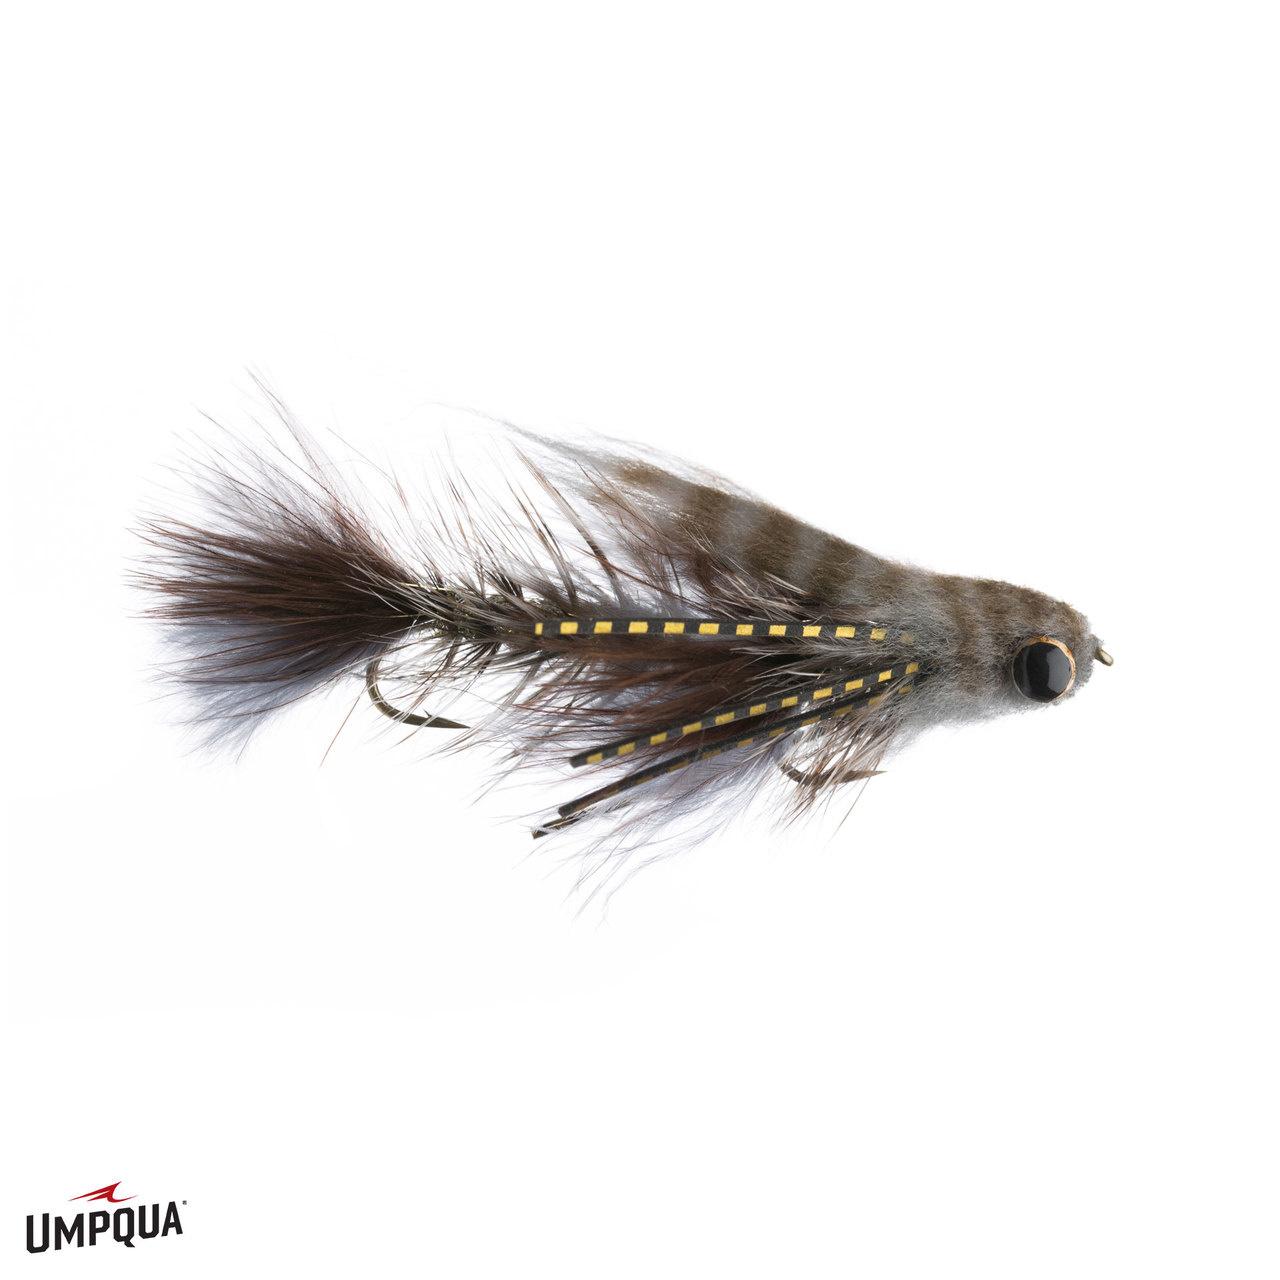 Umpqua Feather Merchants Cravens Baby Gonga